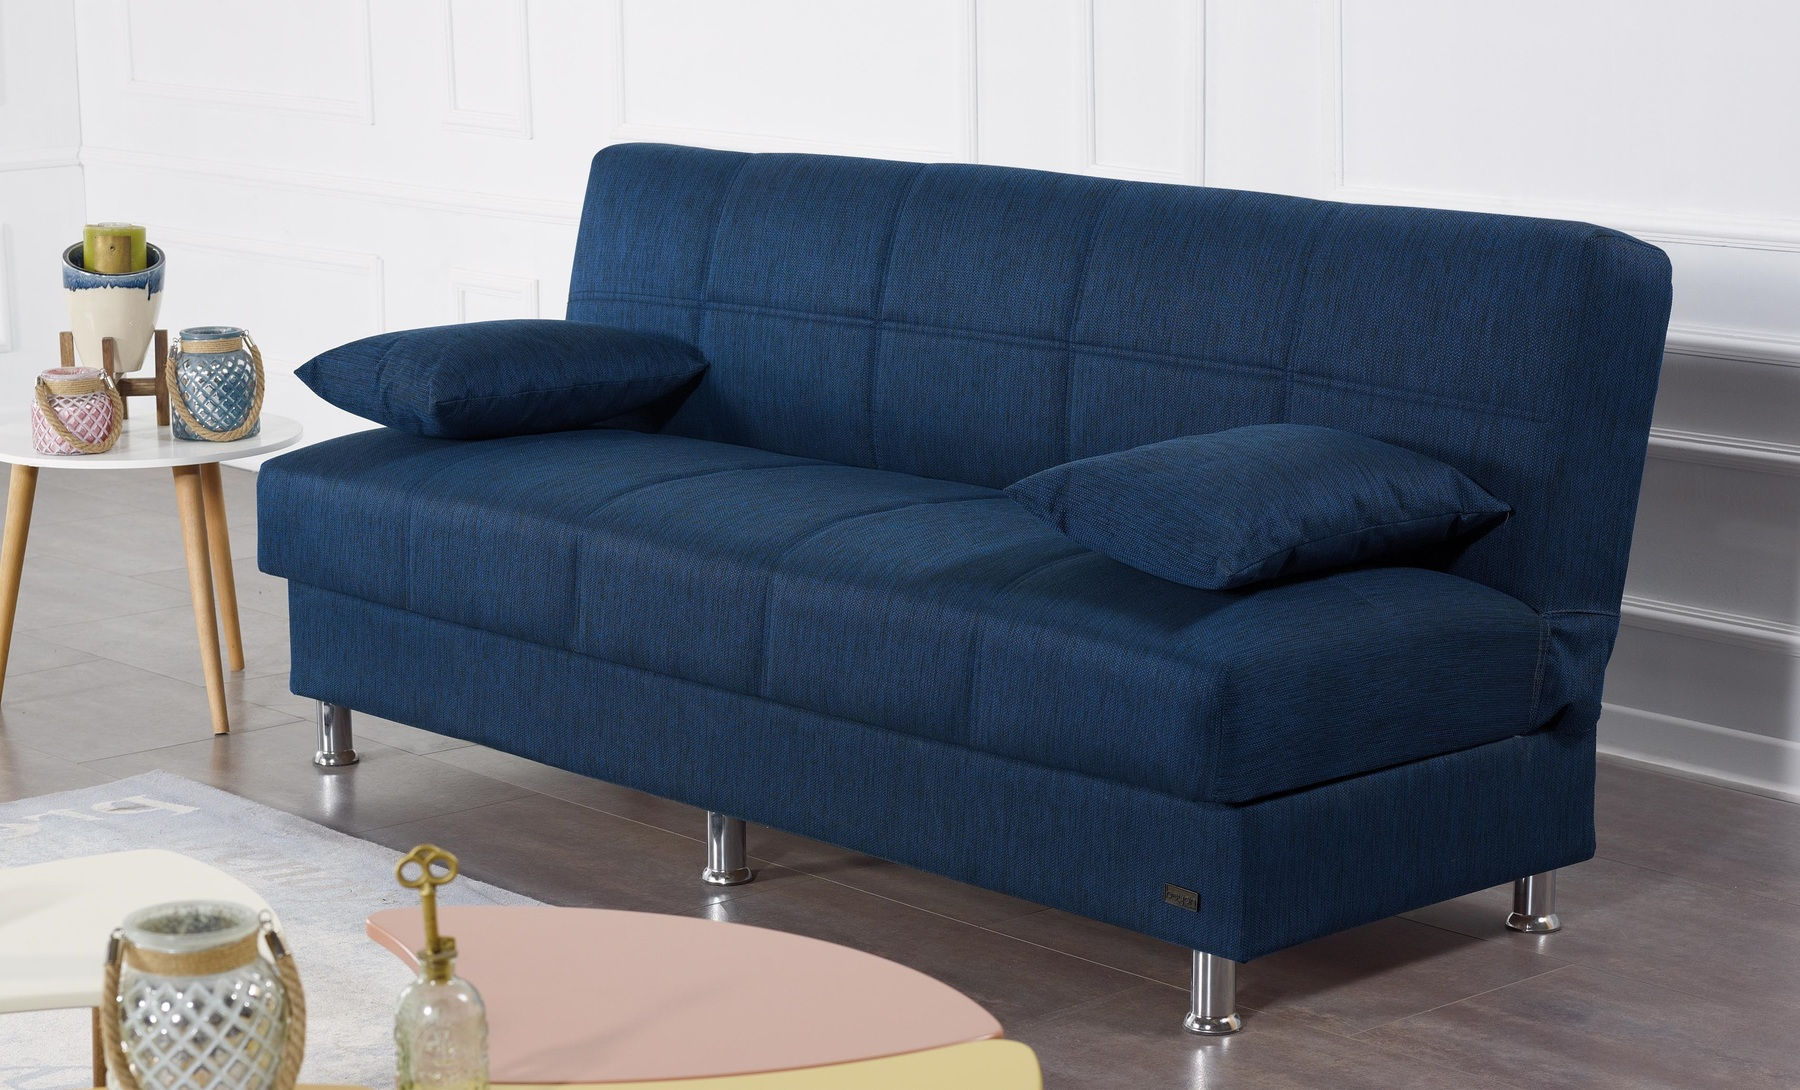 Outstanding London Sofa Bed Machost Co Dining Chair Design Ideas Machostcouk